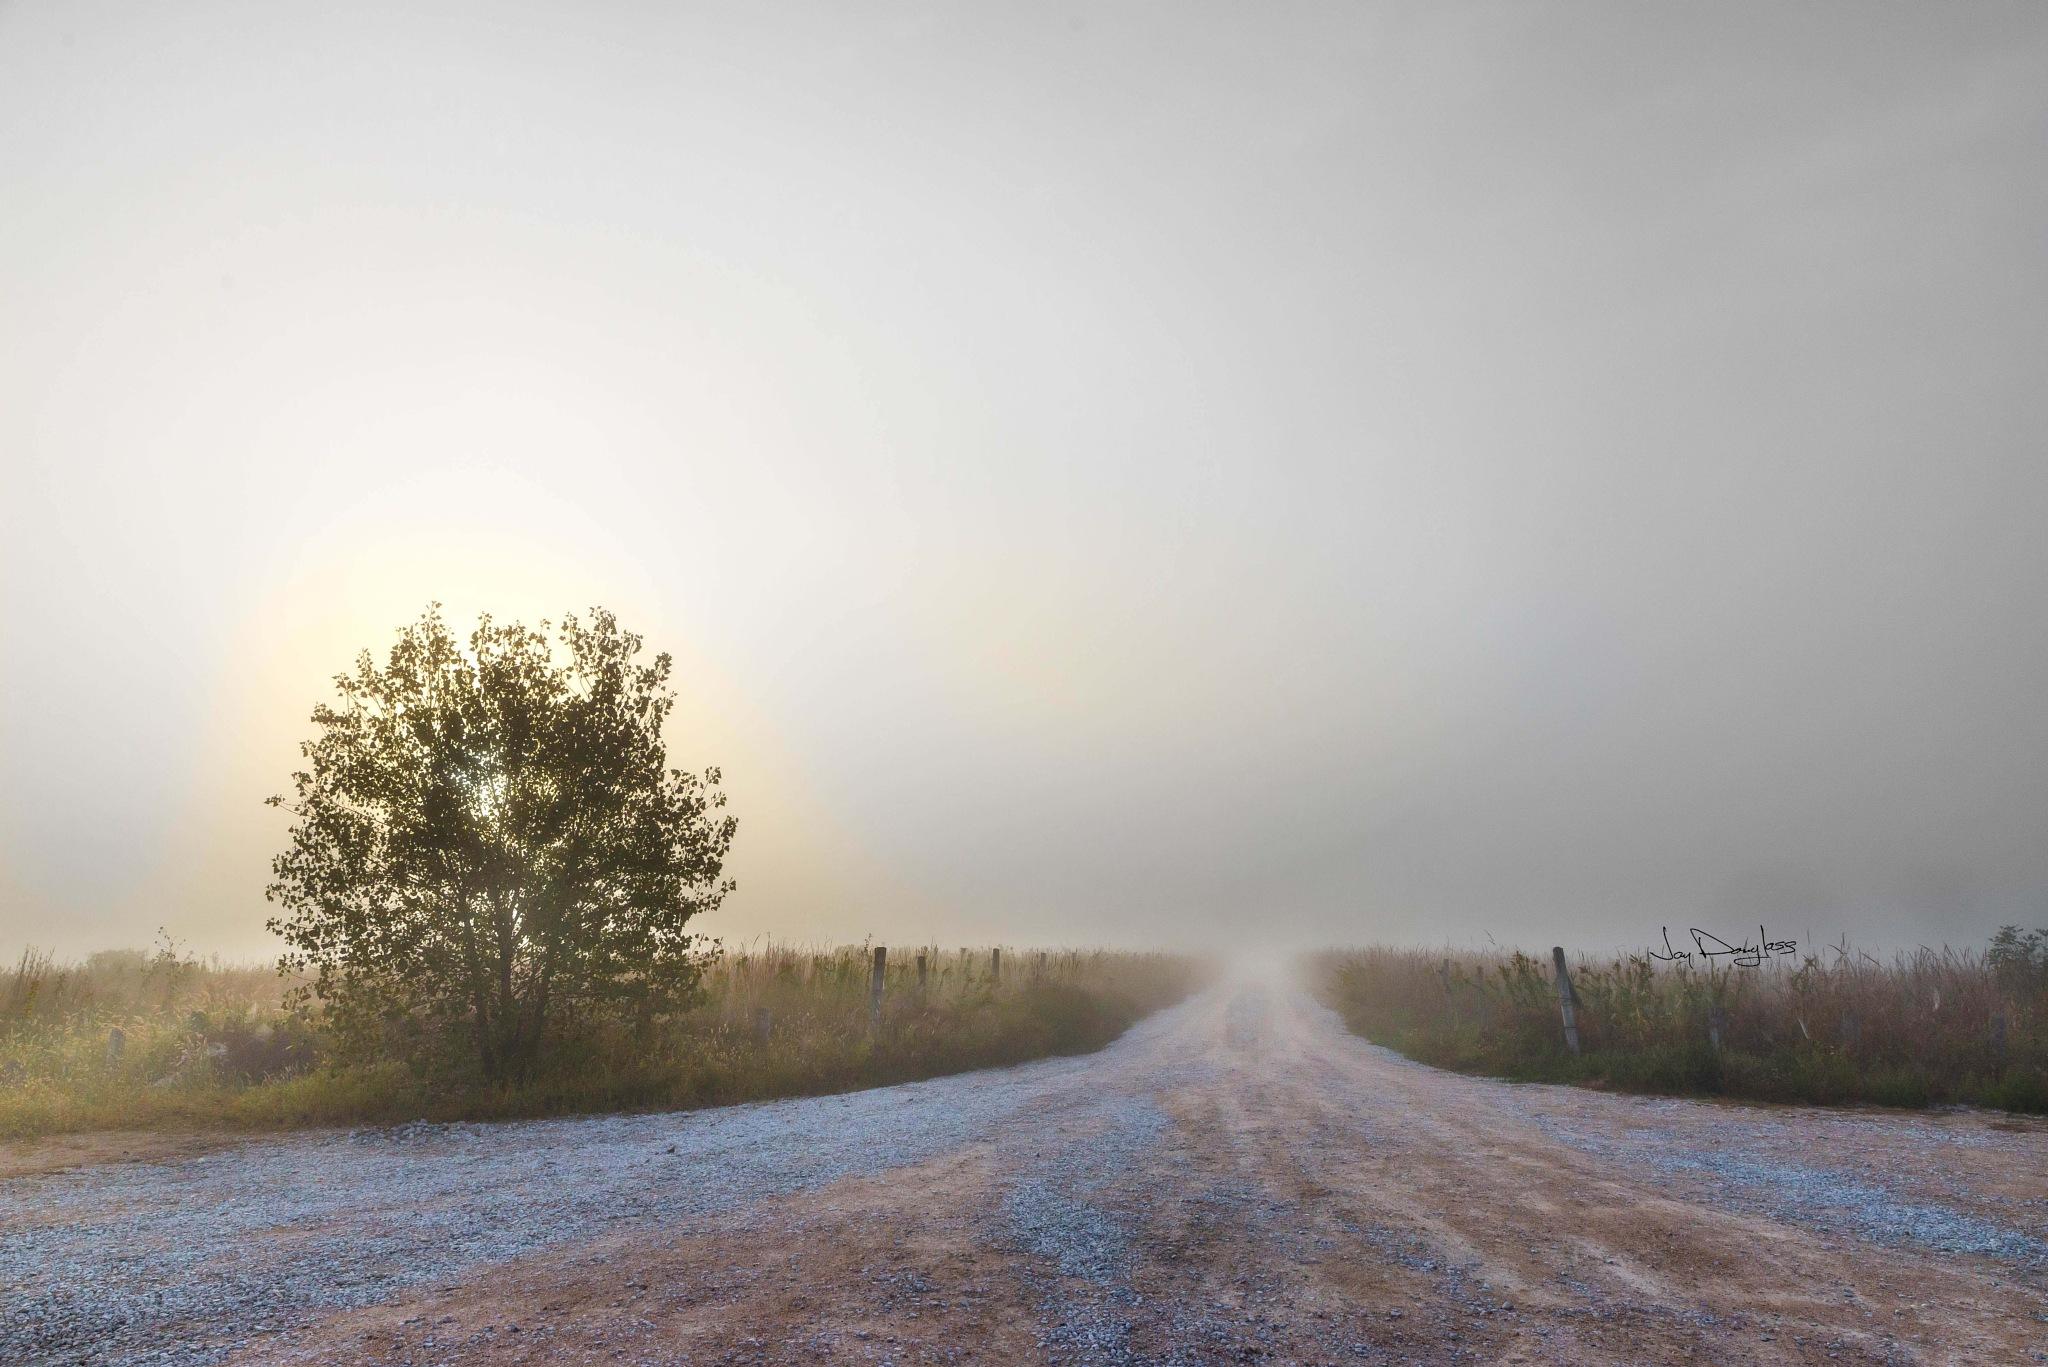 Into the fog by Jay Douglass